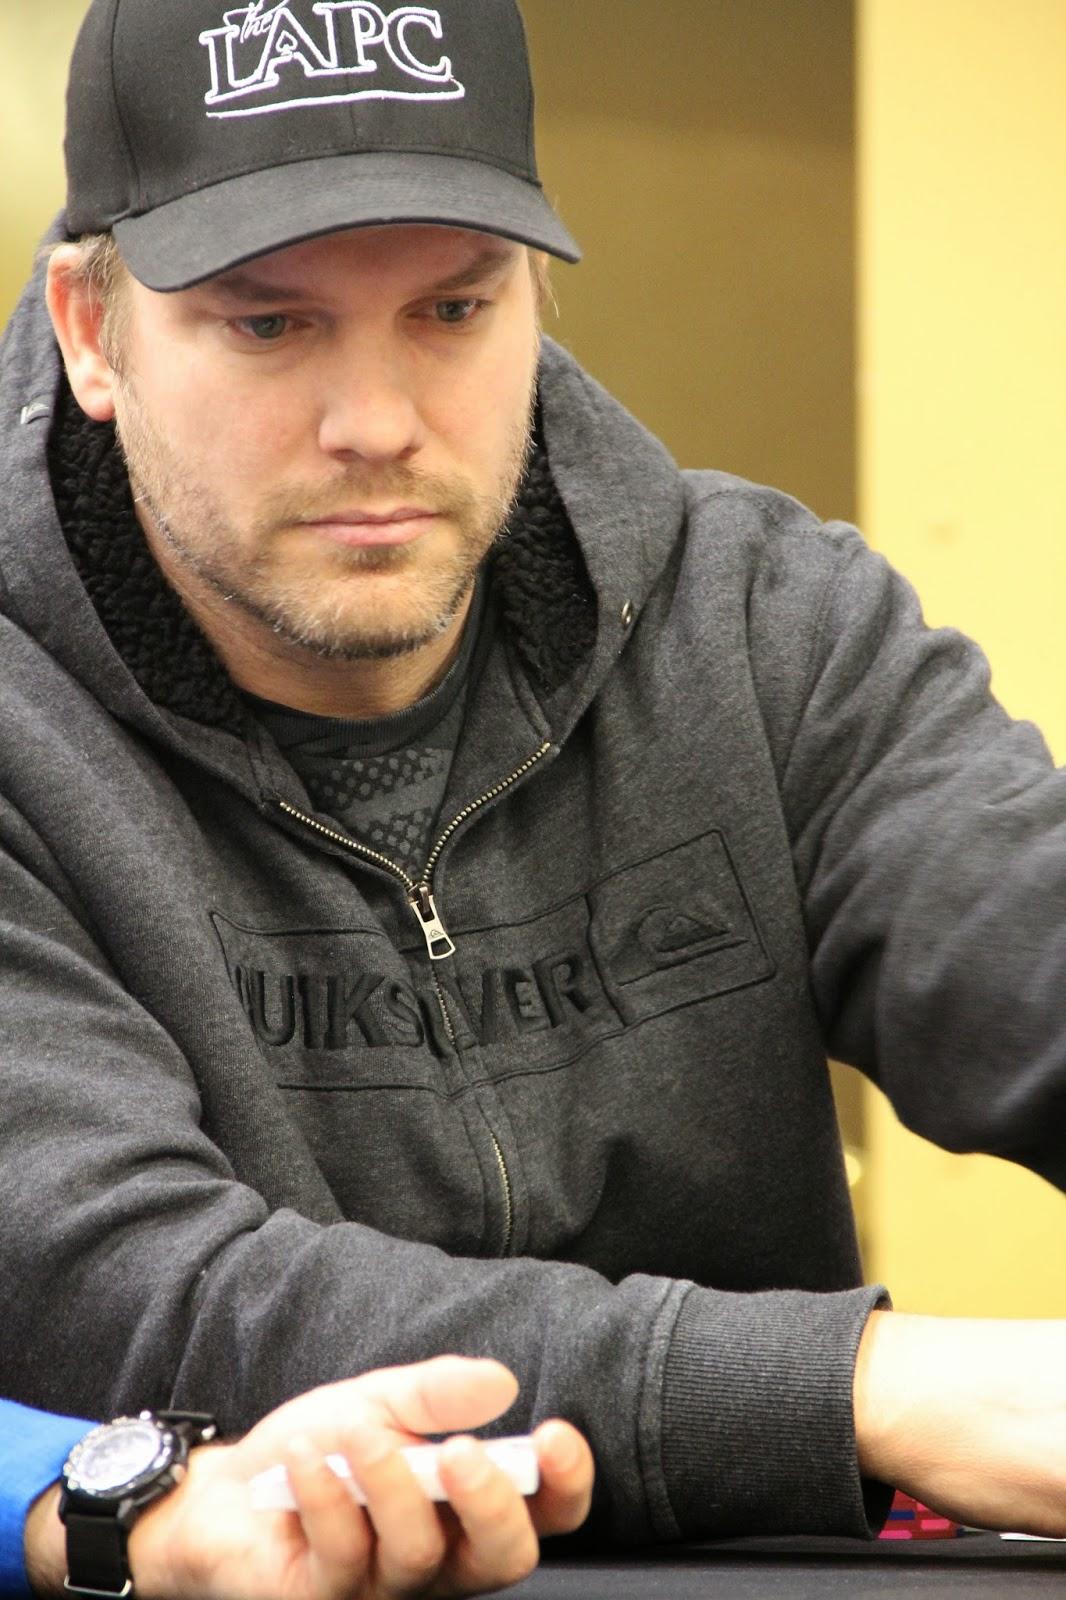 Shawn walker poker kensington security slot adapter kit